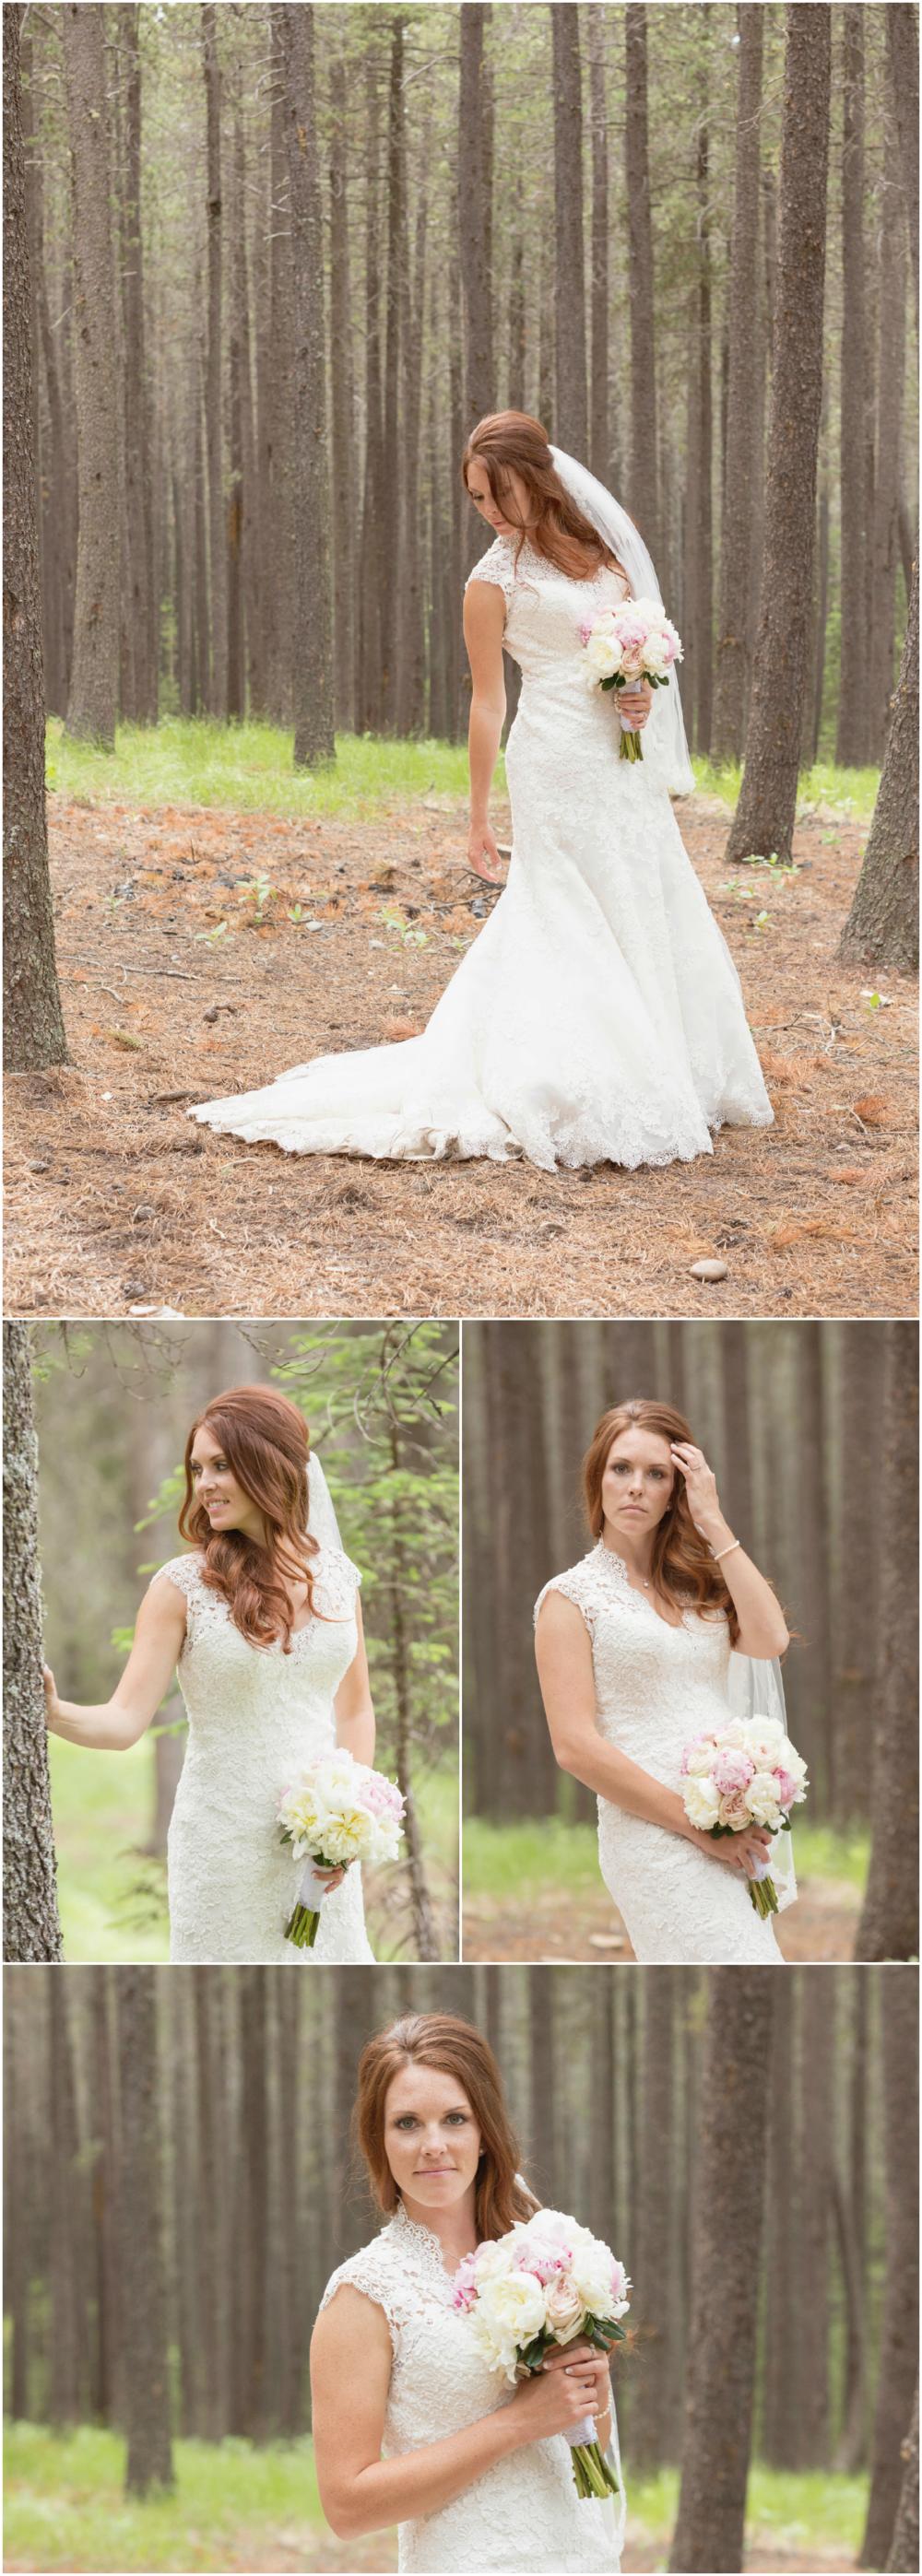 Elkwater-Cypress-Hills-Wedding_33.png